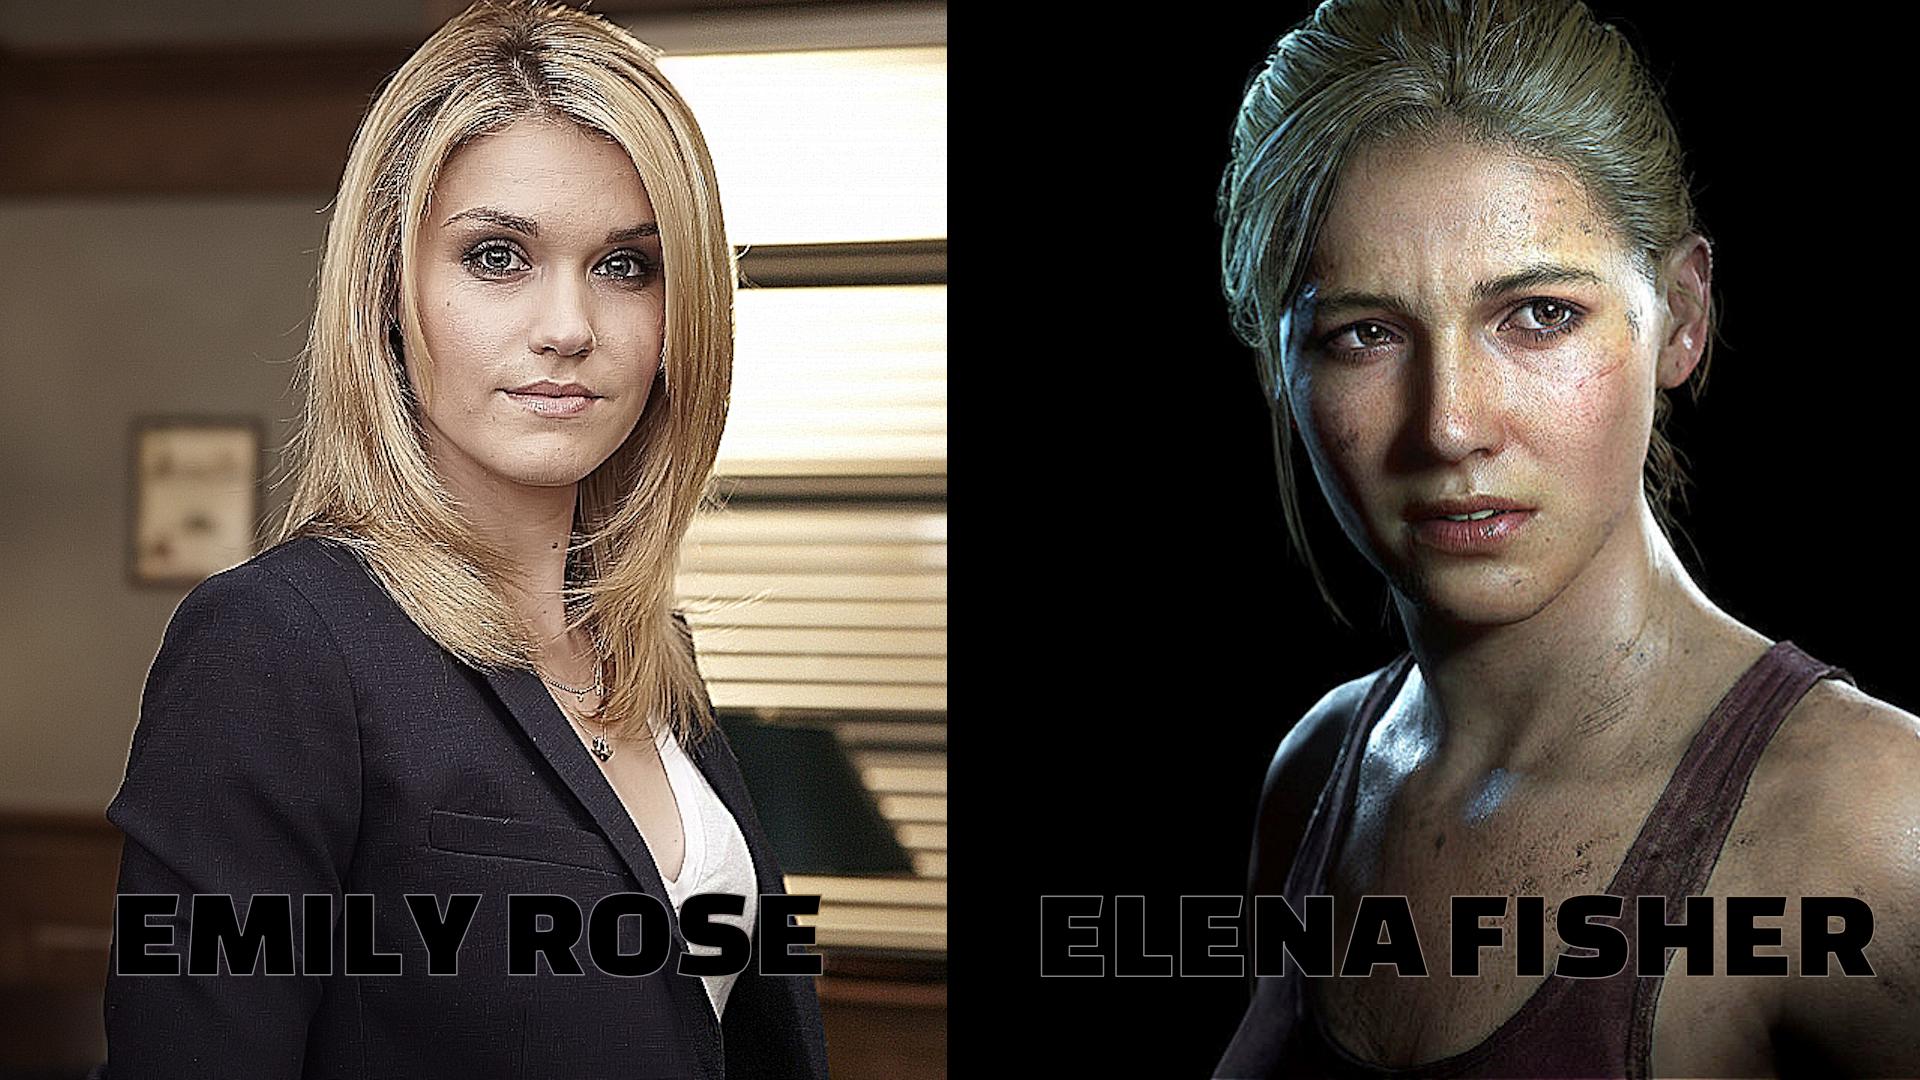 EMILY VS ELENA